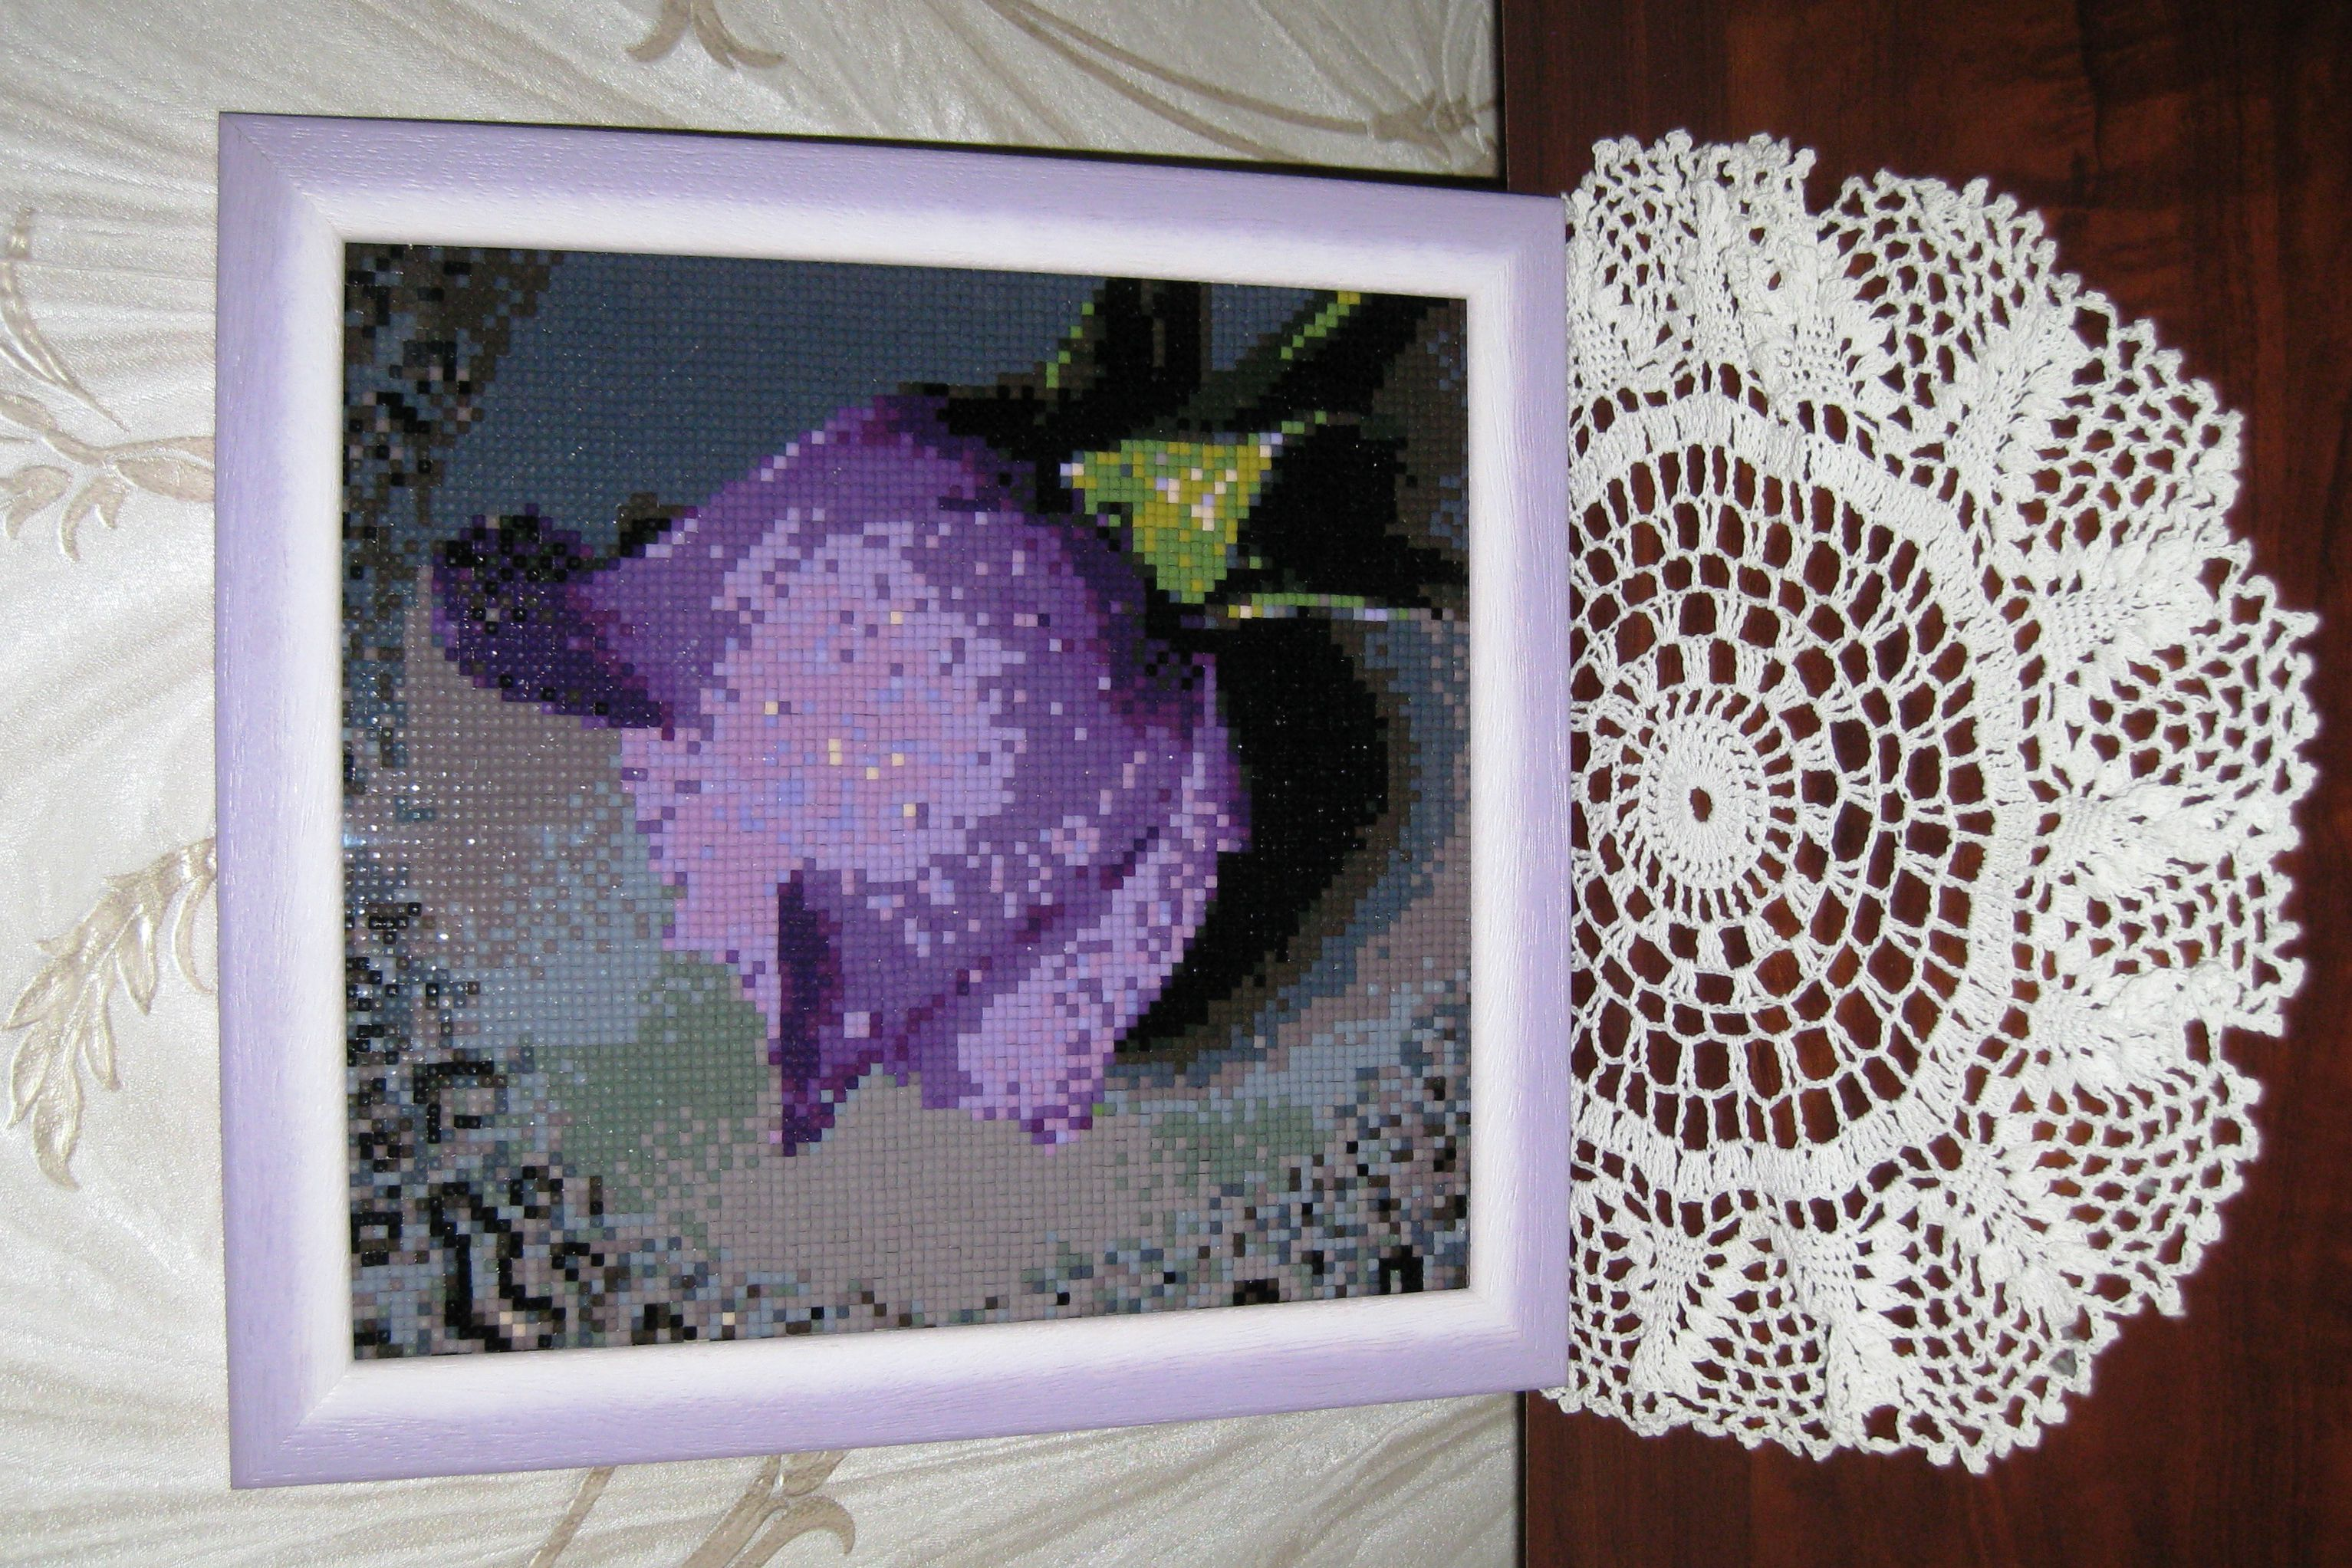 handmade gift painting creativity embroidery originalgift rhinestones mosaicembroidery acrylicrhinestones